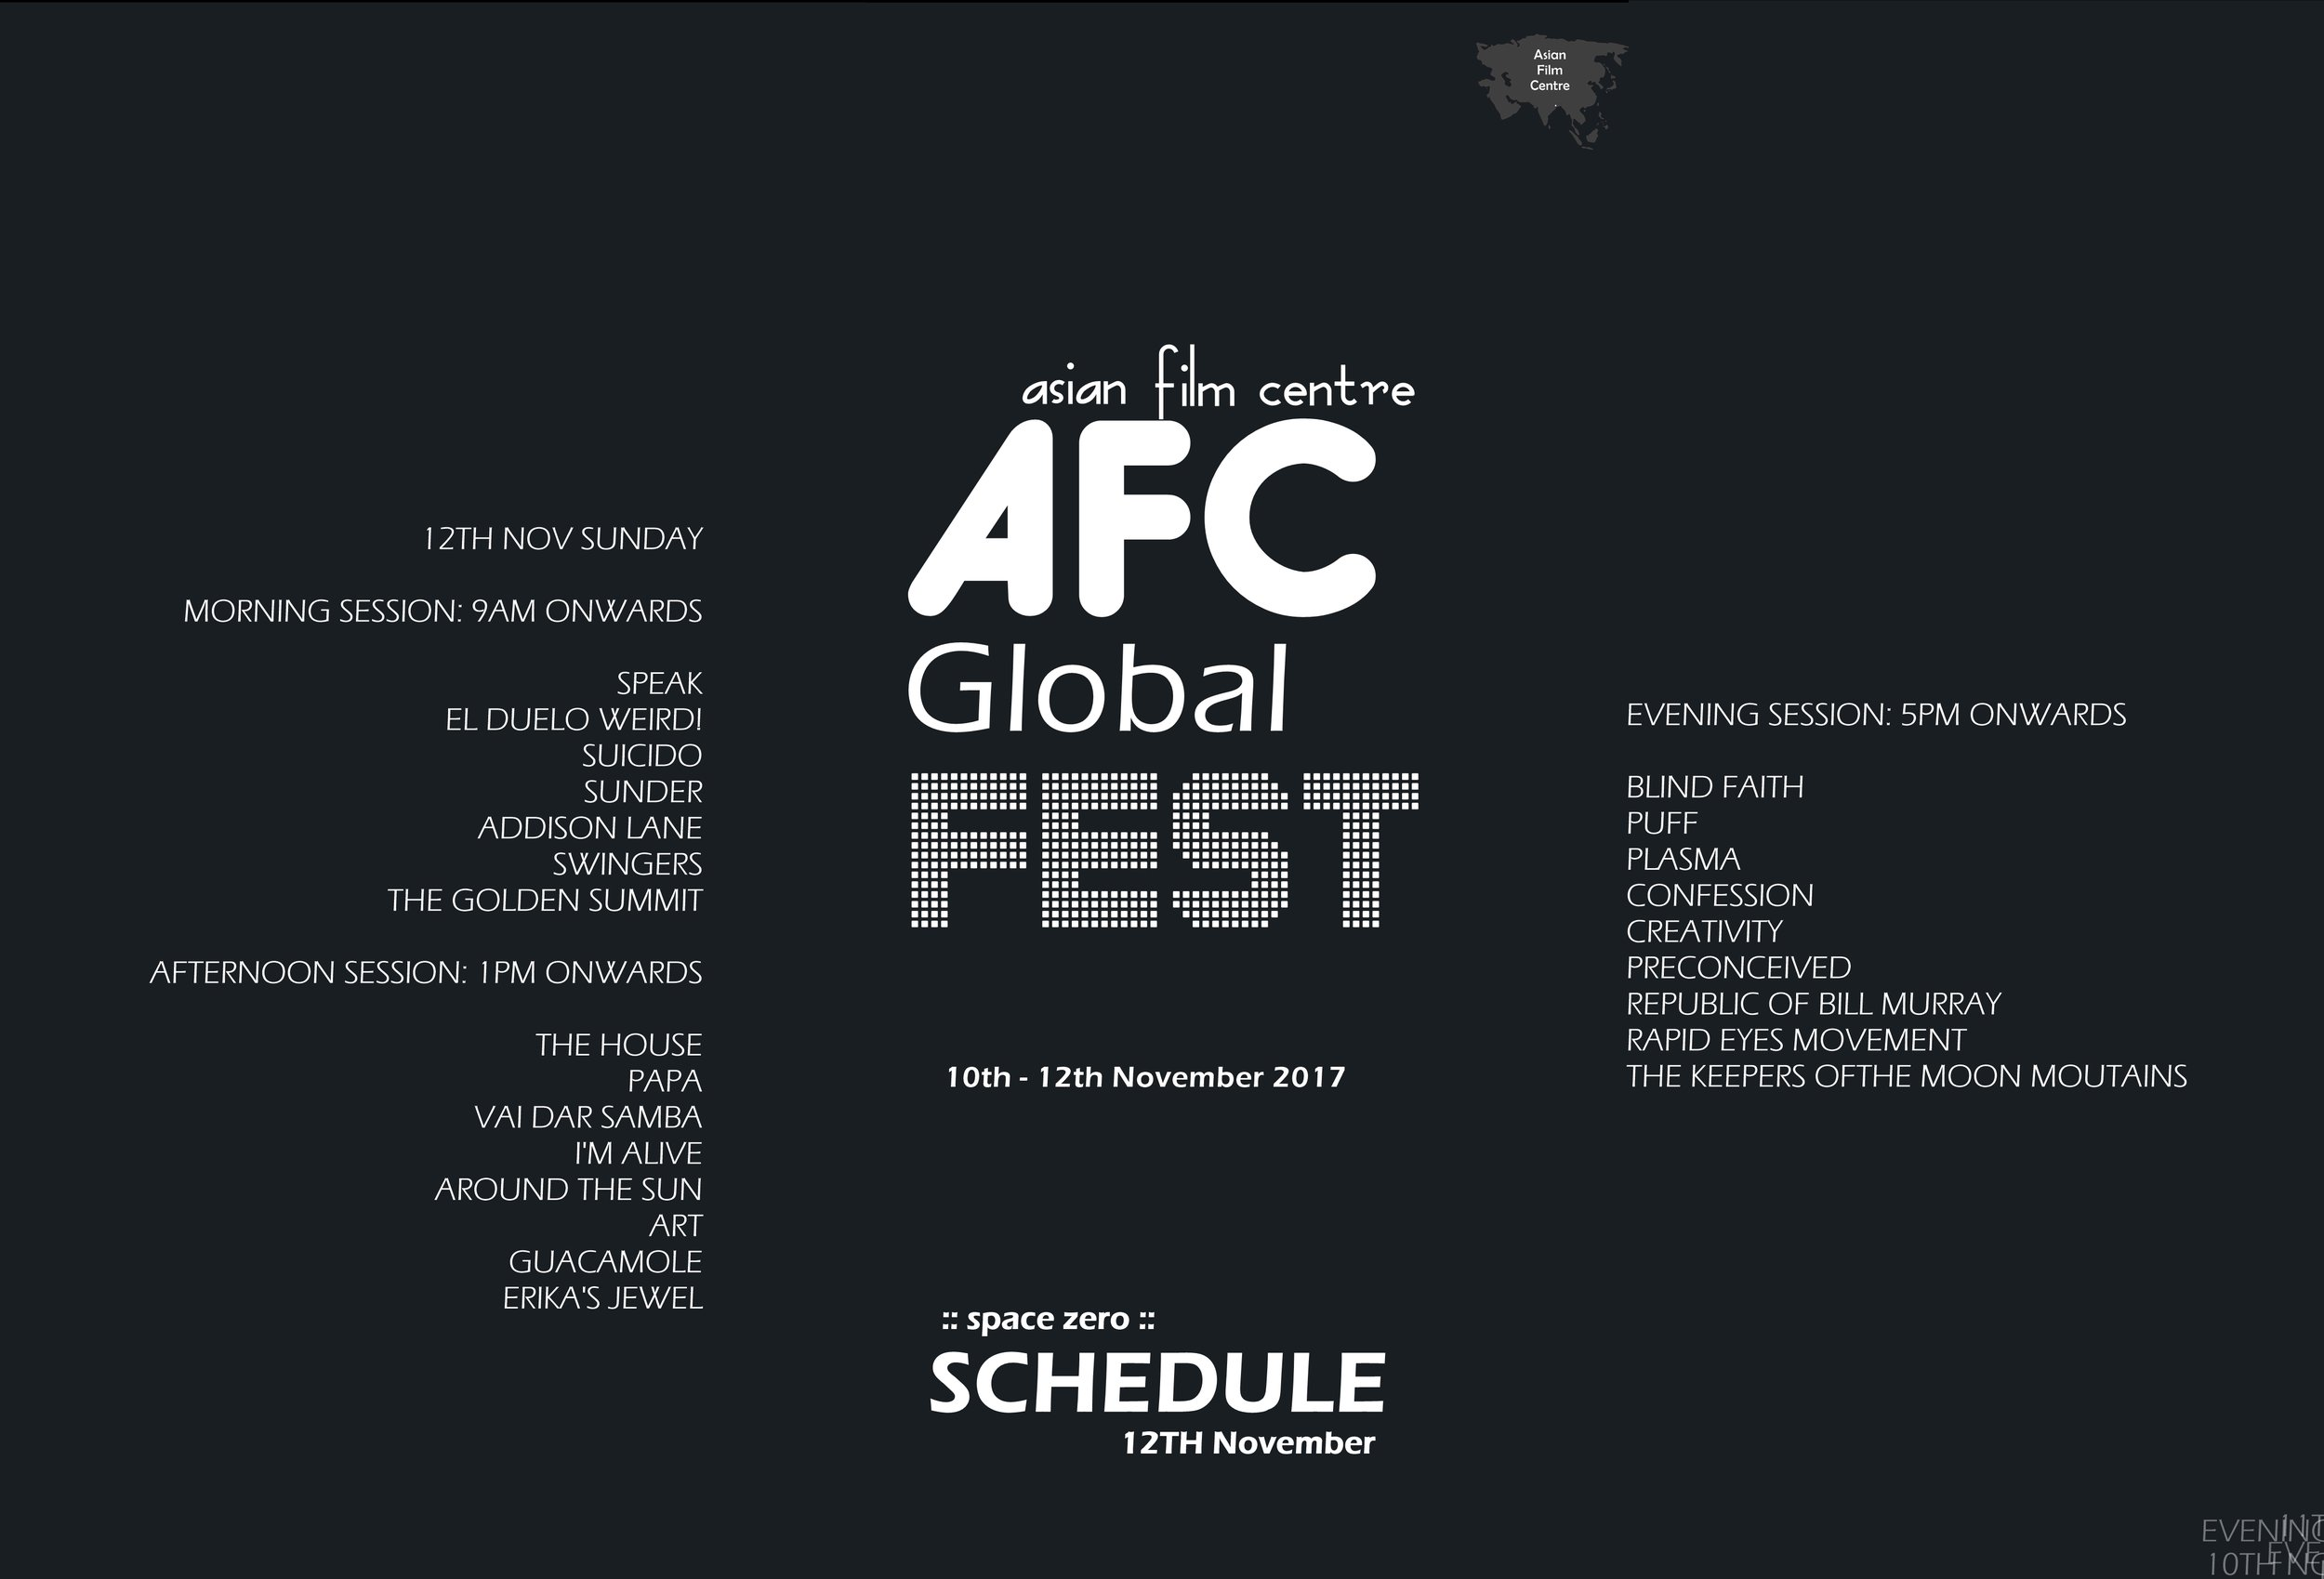 AFC-Global-Fest-SChedule-12th-Nov_ZERO-2.jpg